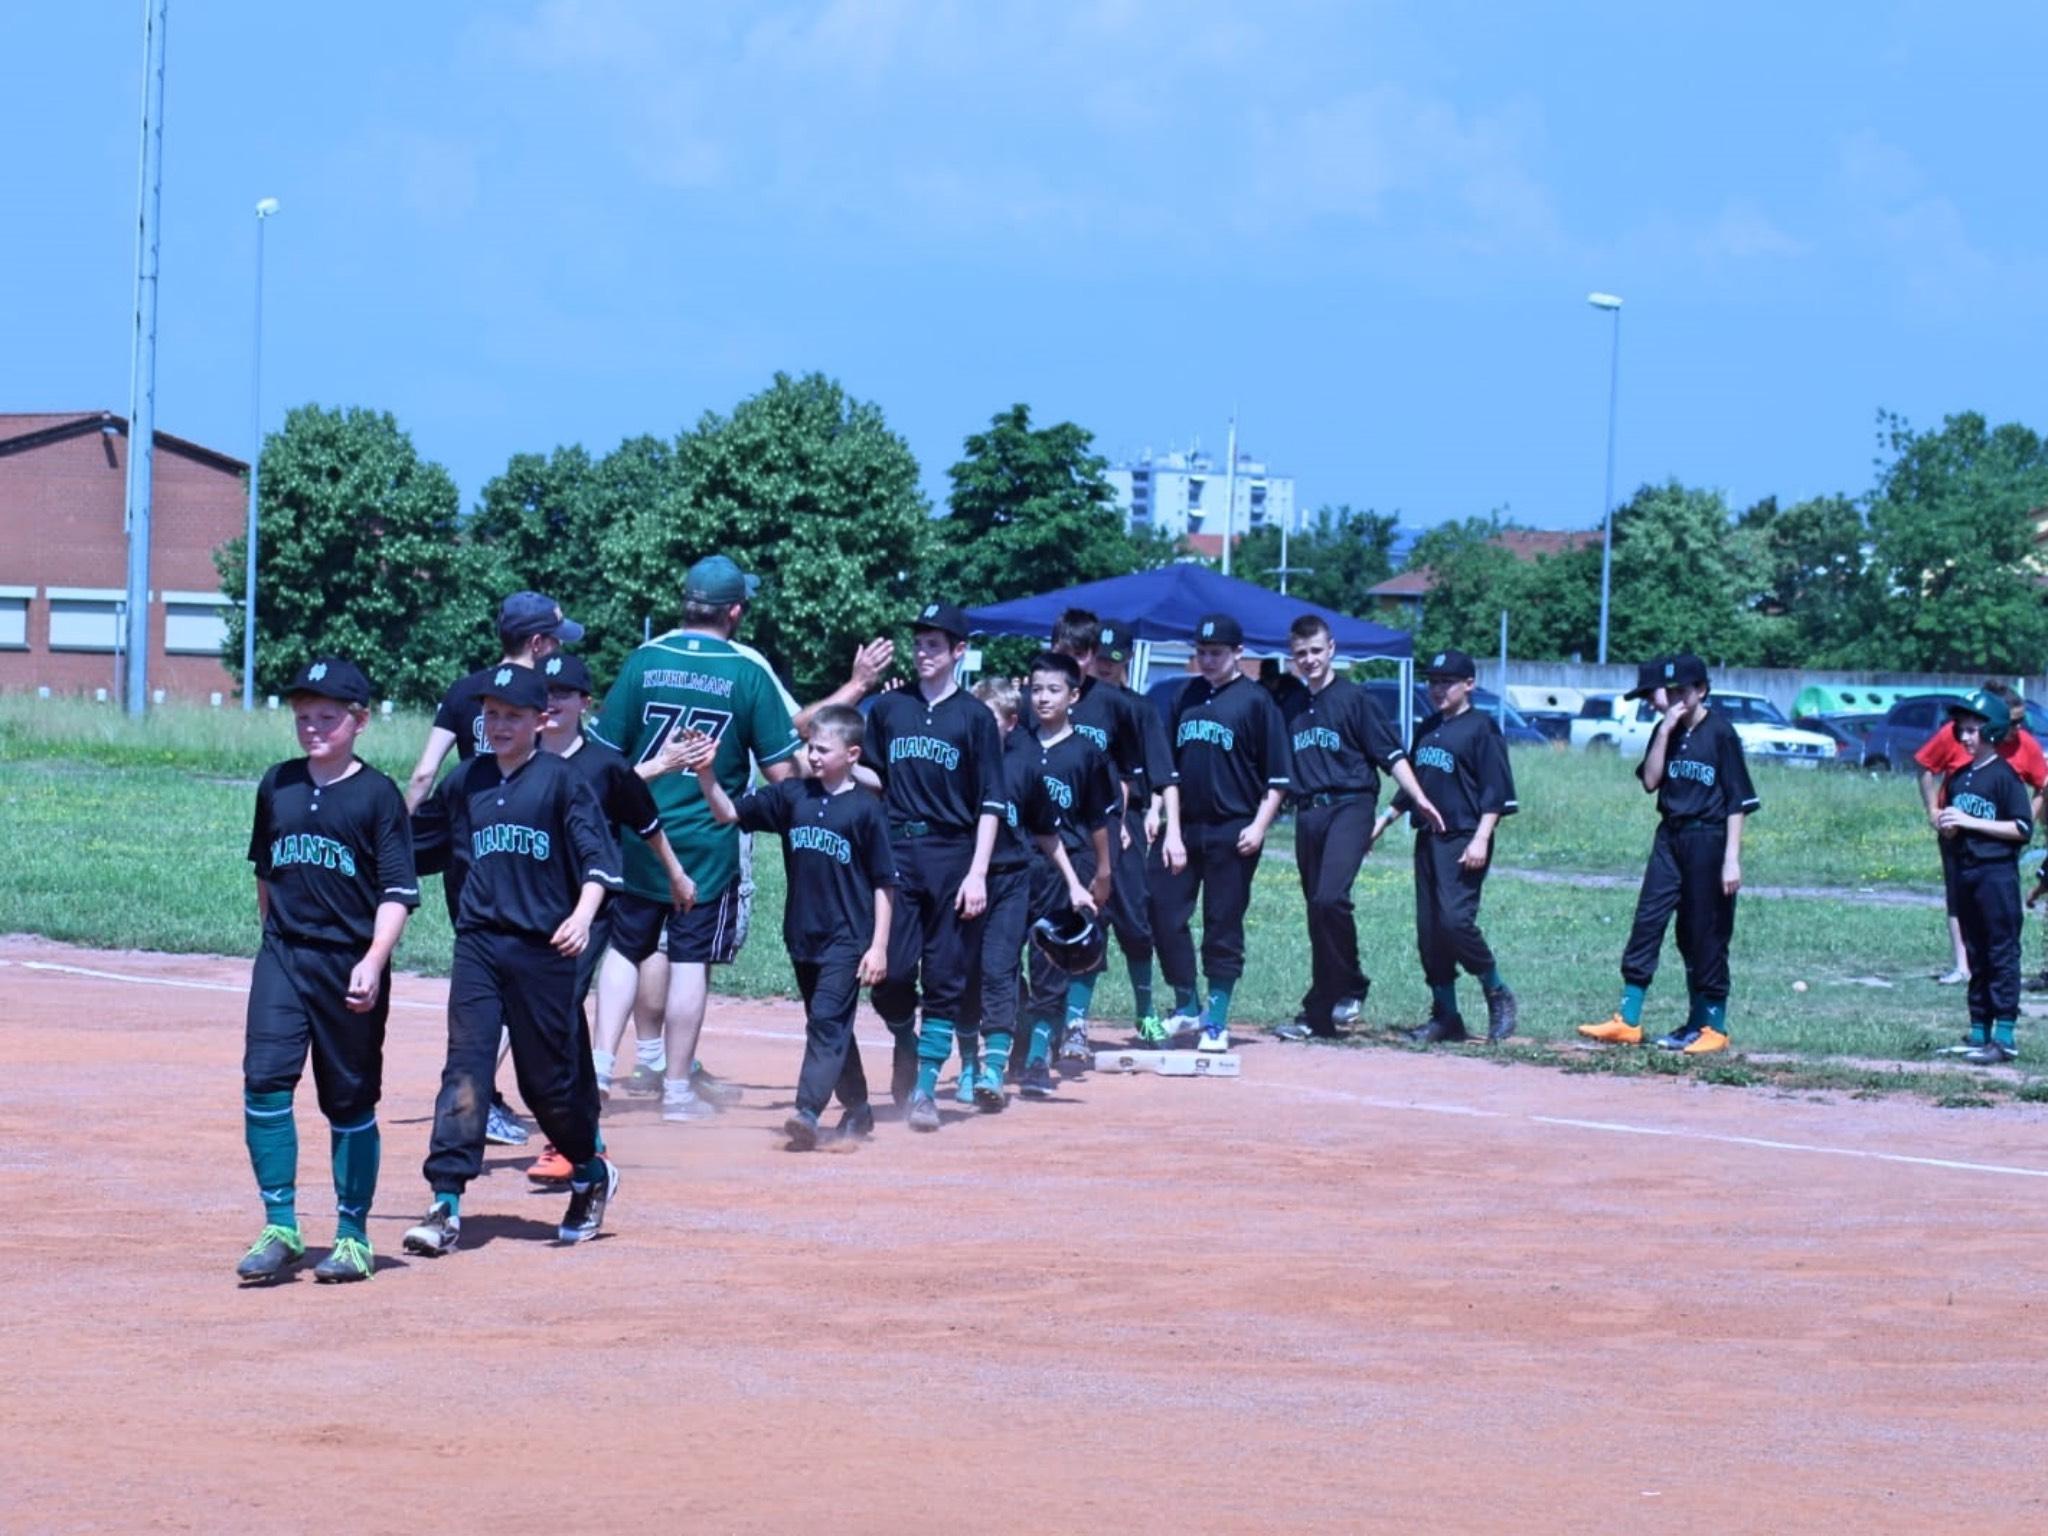 DJK Baseball Giants auf dem Weg zum Spielfeld. Foto:DJK Schweinfurt